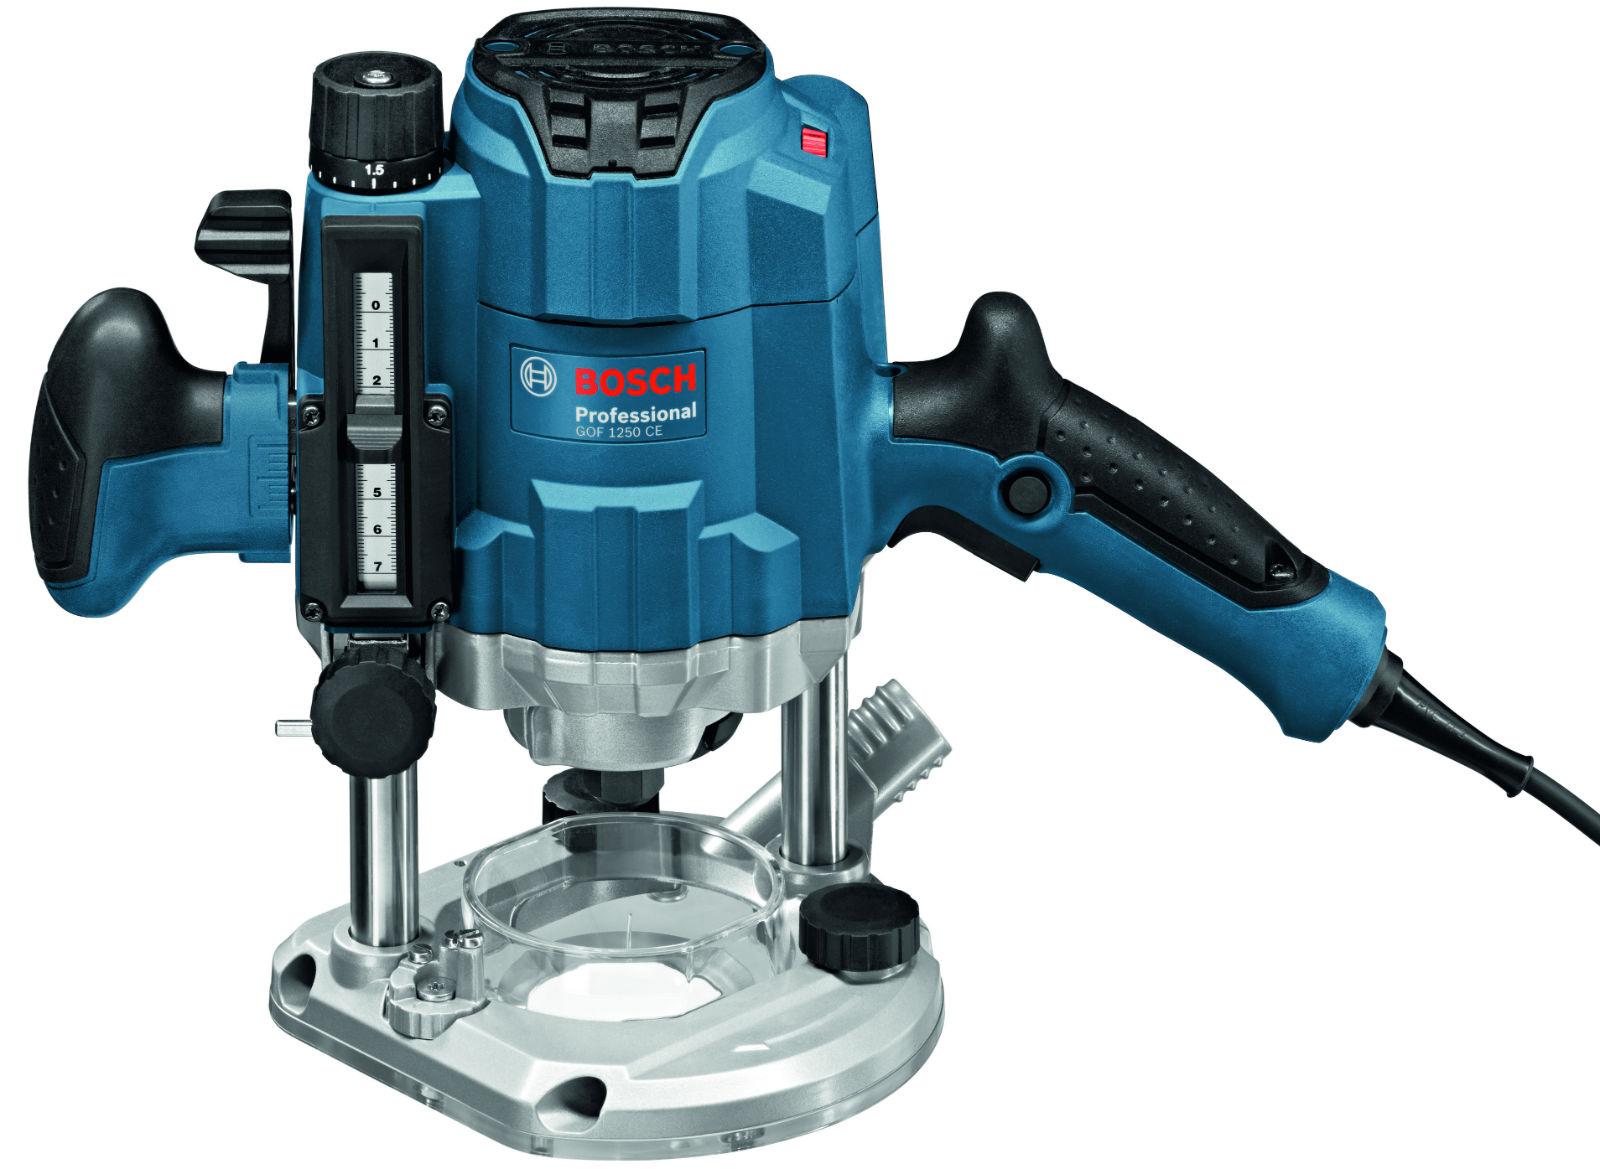 ������ Bosch 601626000 gof 1250 ce